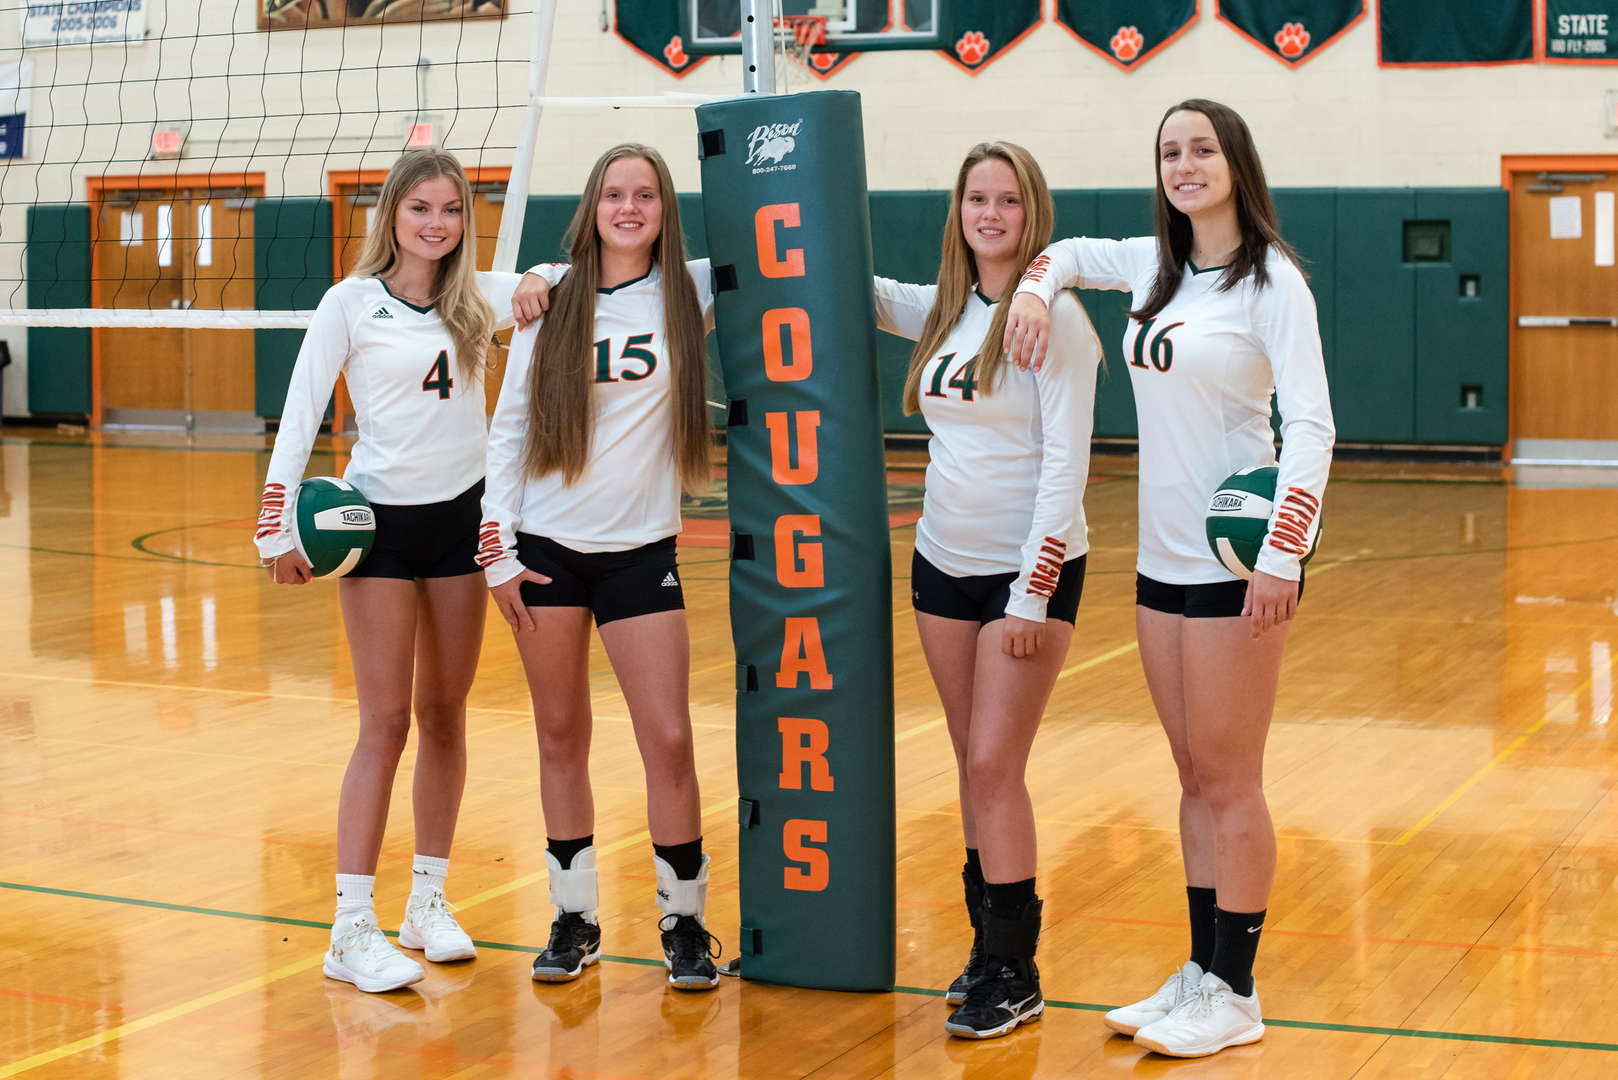 Girls Volleyball Seniors